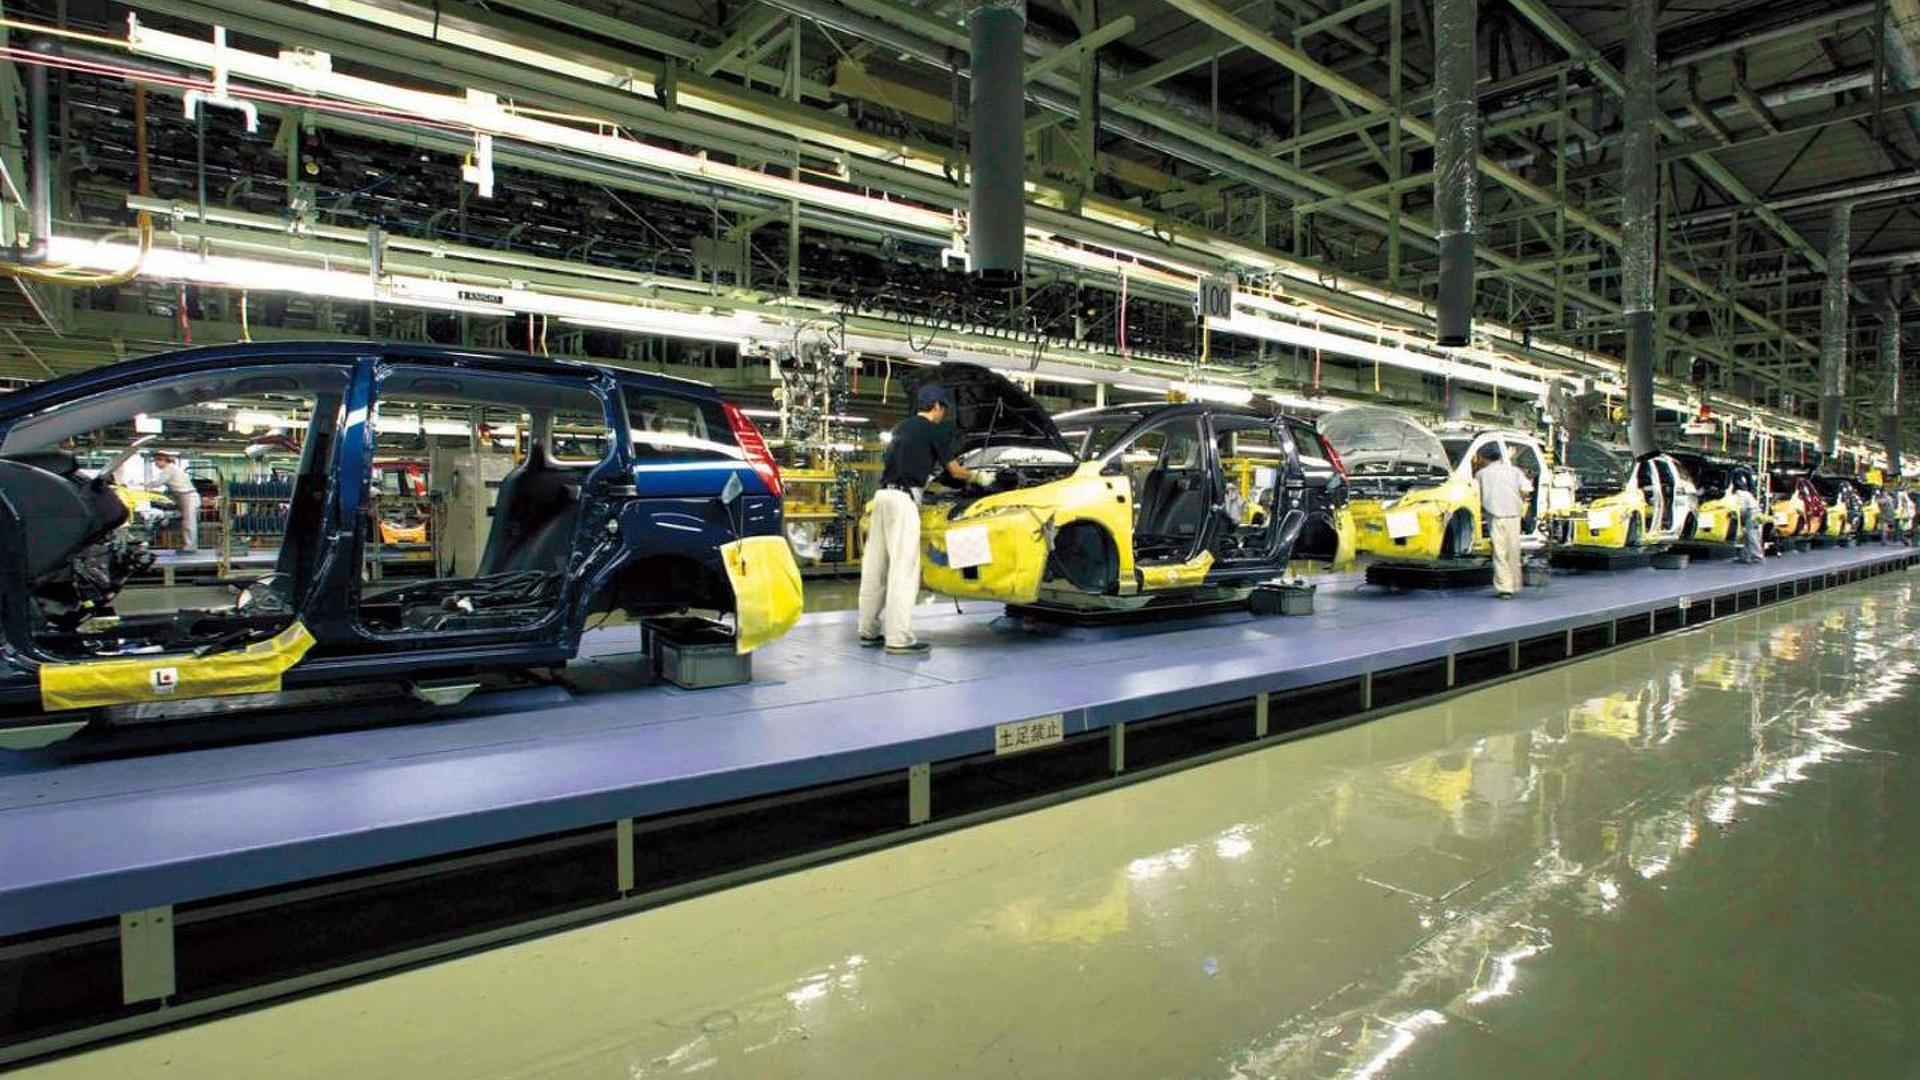 Former Mazda employee goes on rampage at Hiroshima plant - kills one